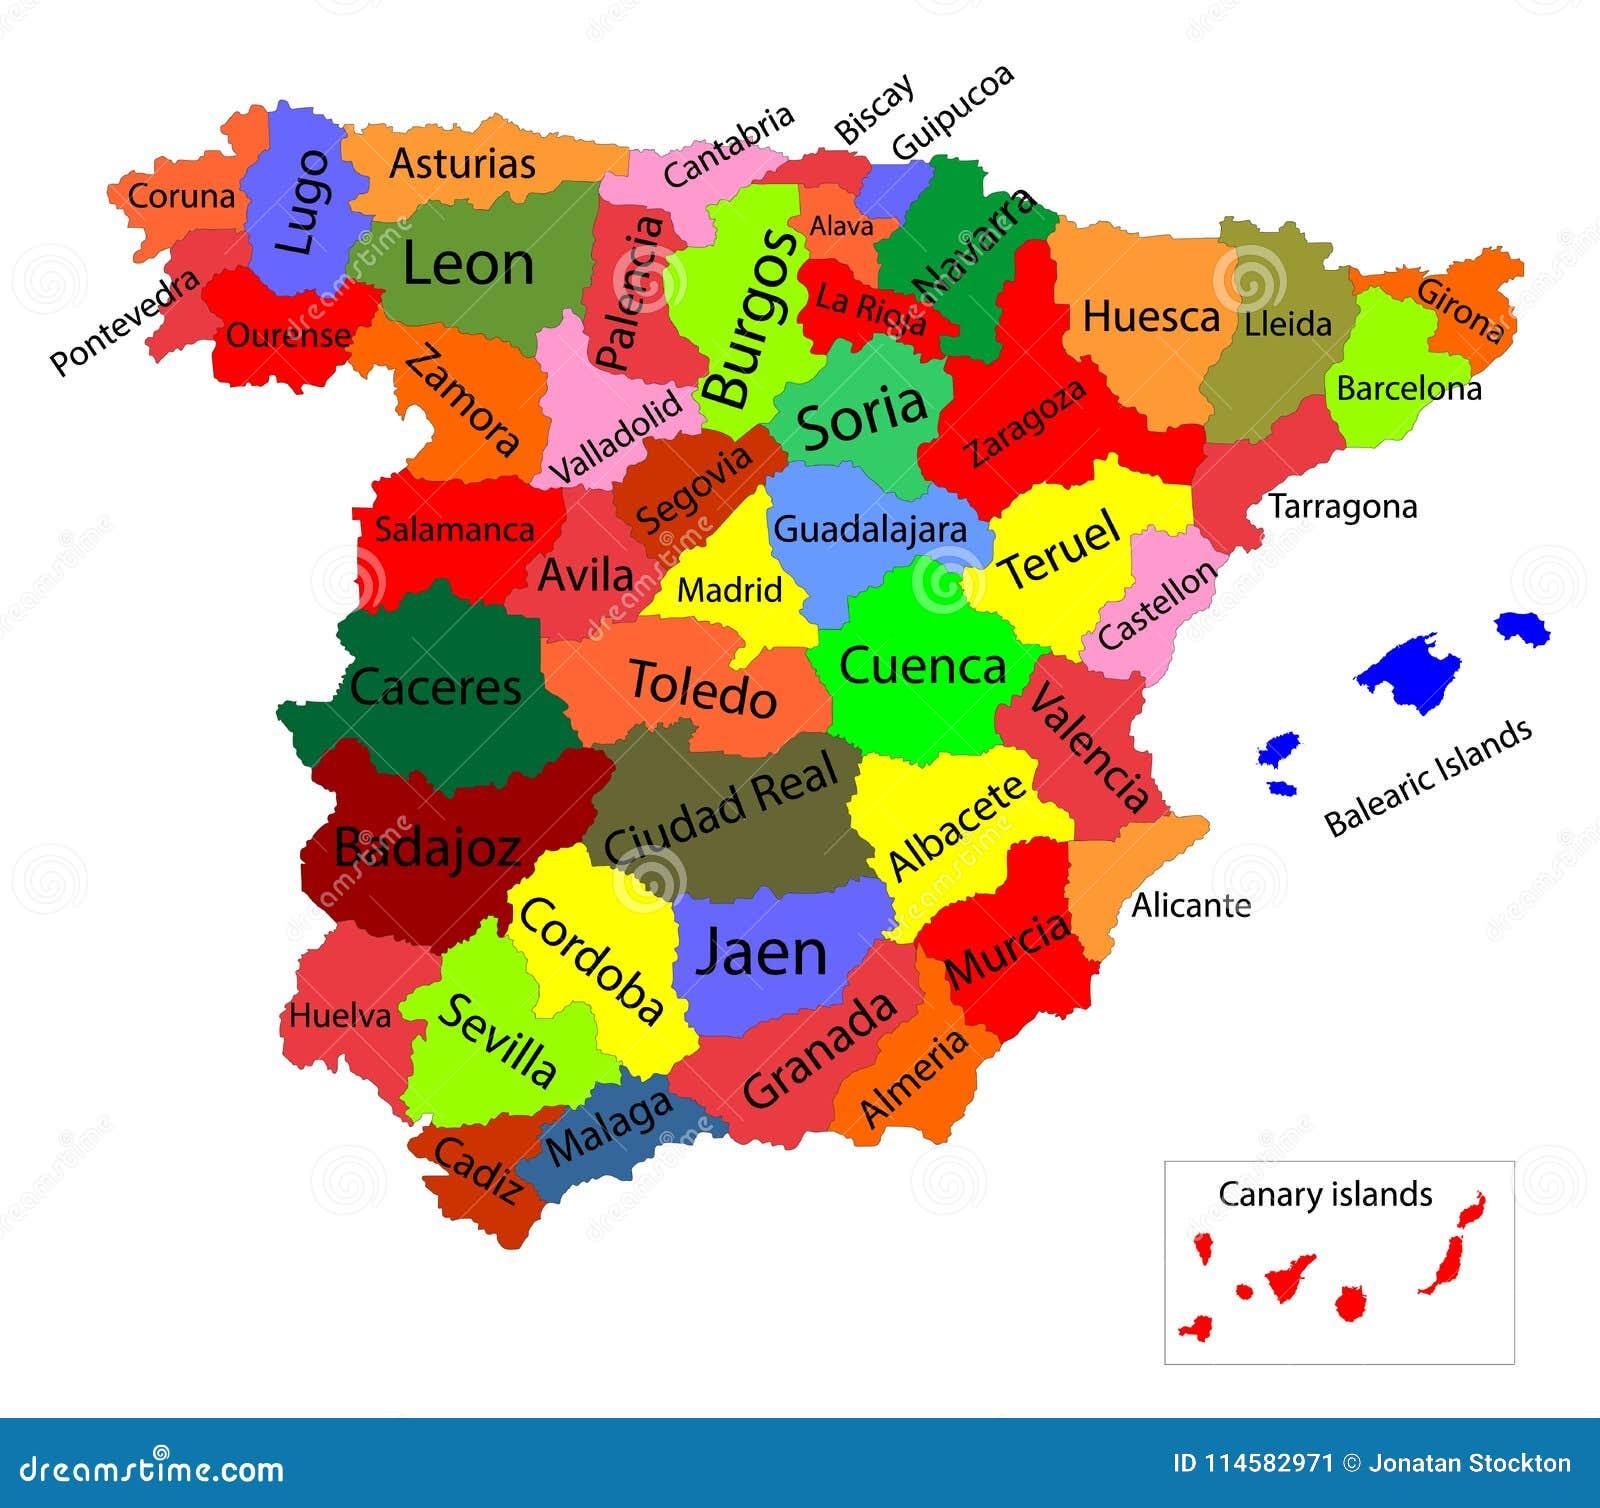 Autonome Regionen Spanien Karte.Editable Bunte Karte Von Spanien Autonome Gemeinschaften Von